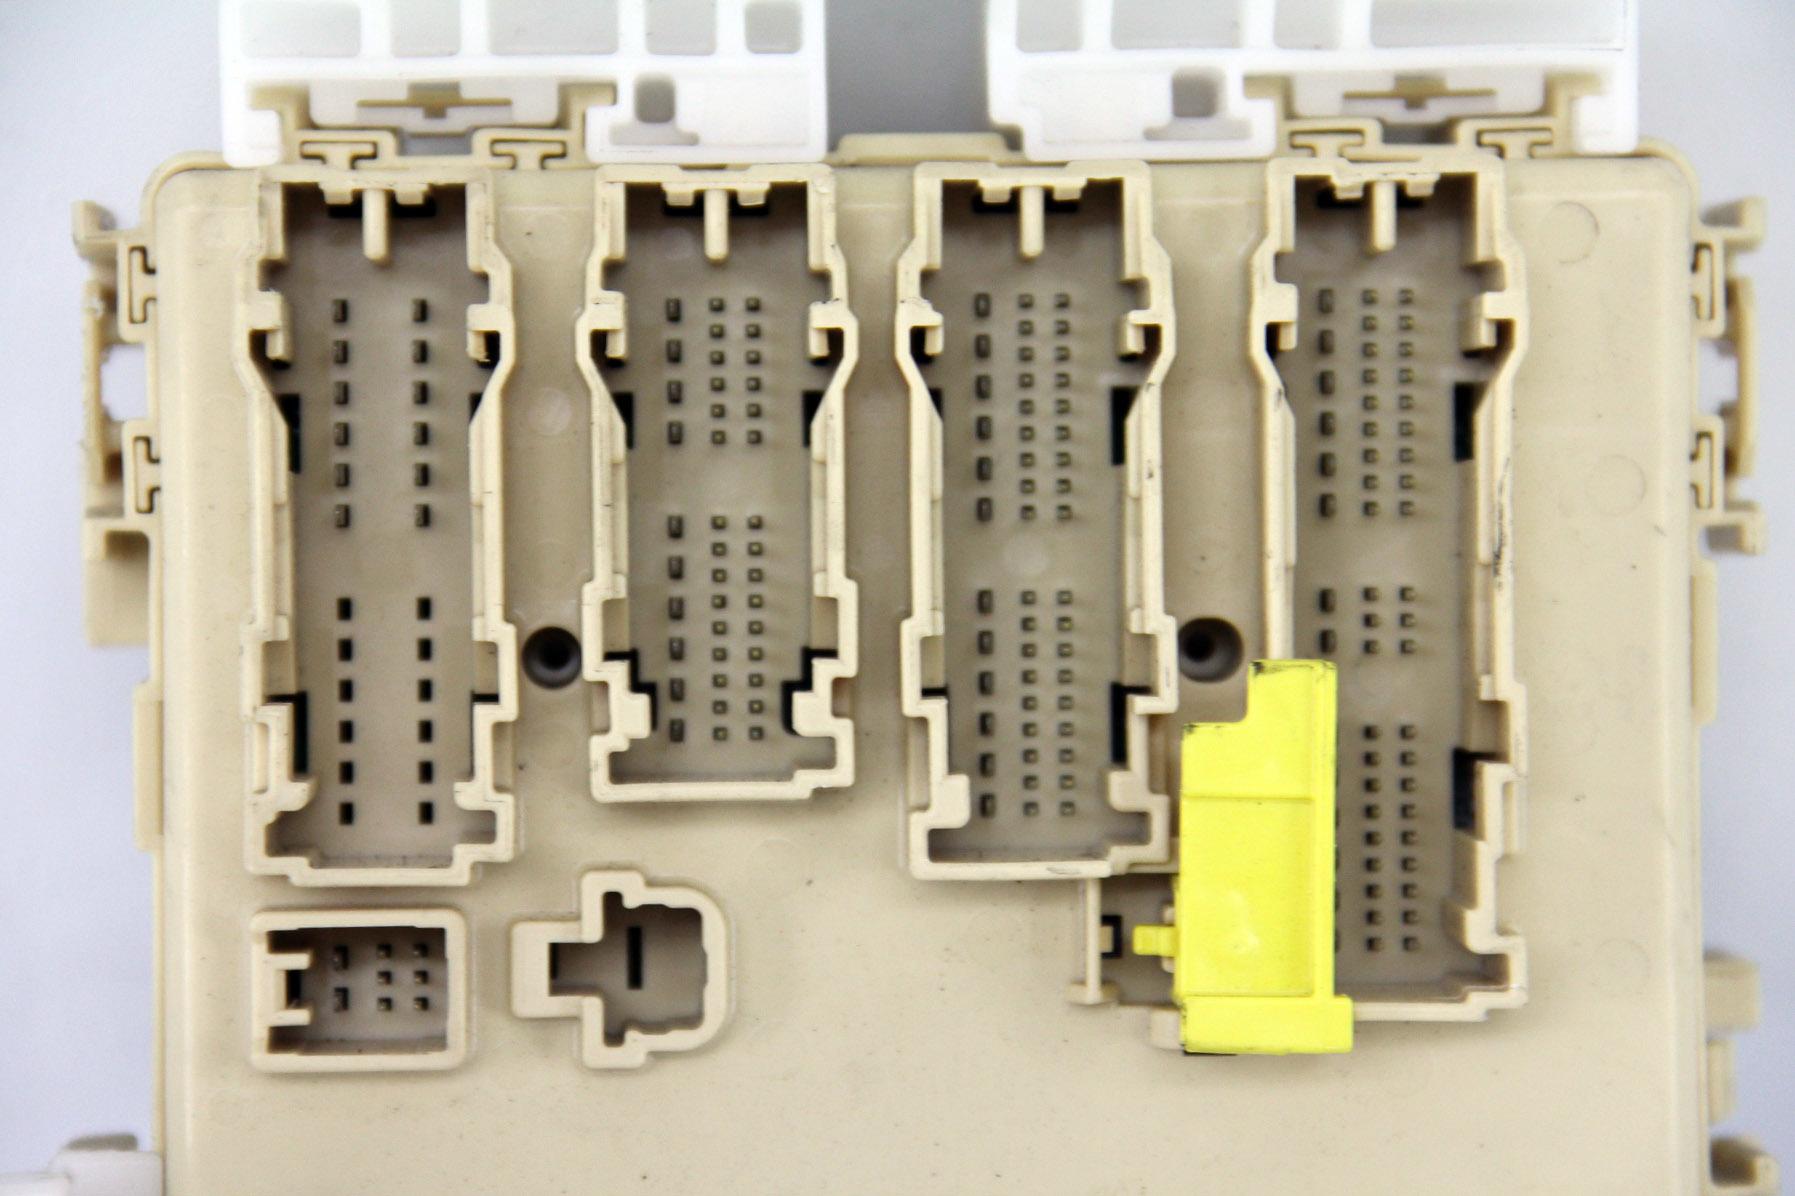 ... Scion tC Interior Under Dash Relay Fuse Box, 11-16, 89221-21080